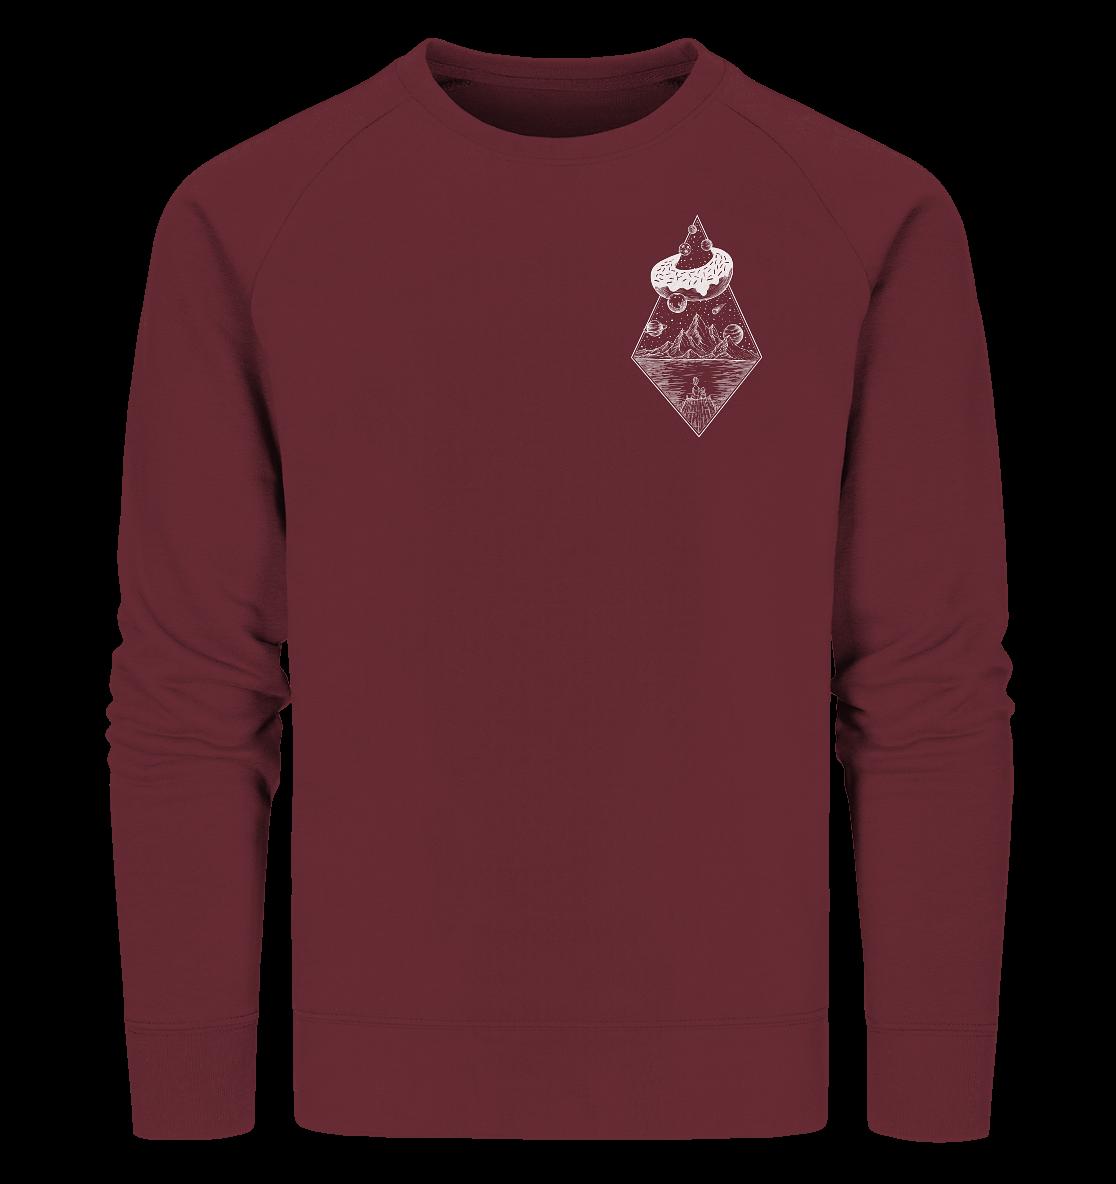 front-organic-sweatshirt-672b34-1116x.png